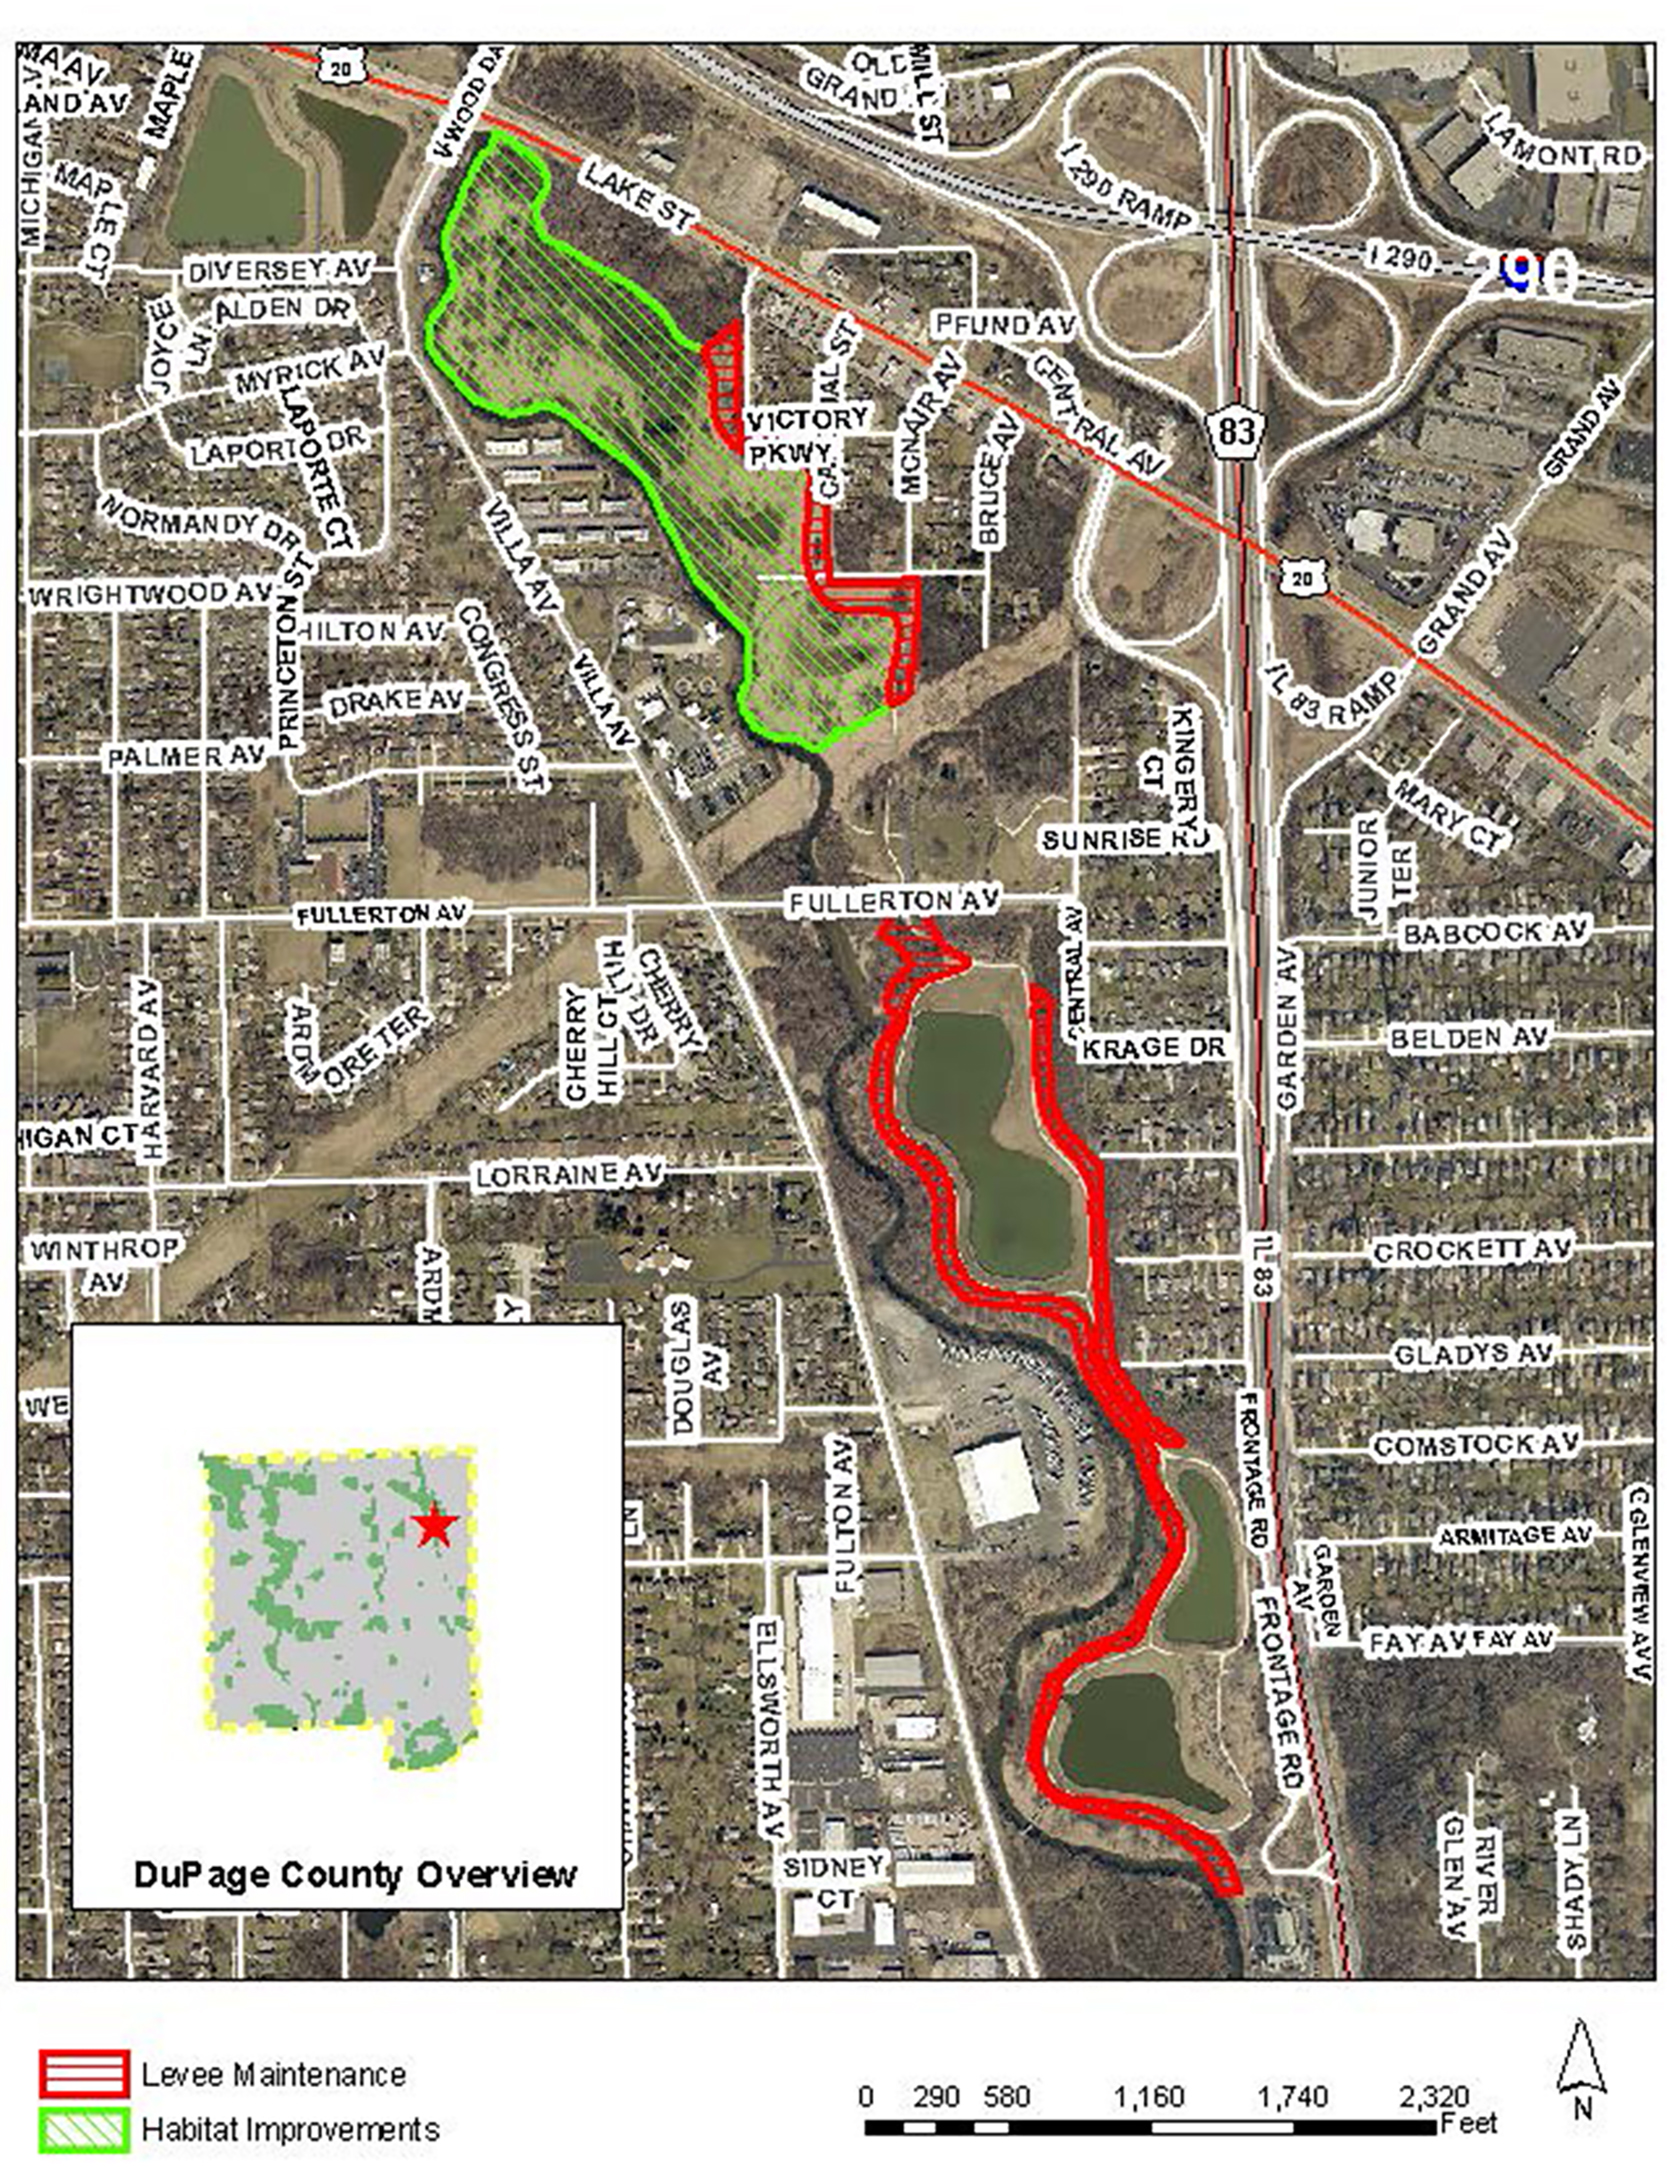 2020-01-22 Cricket-Creek-habitat-maintenance-USE